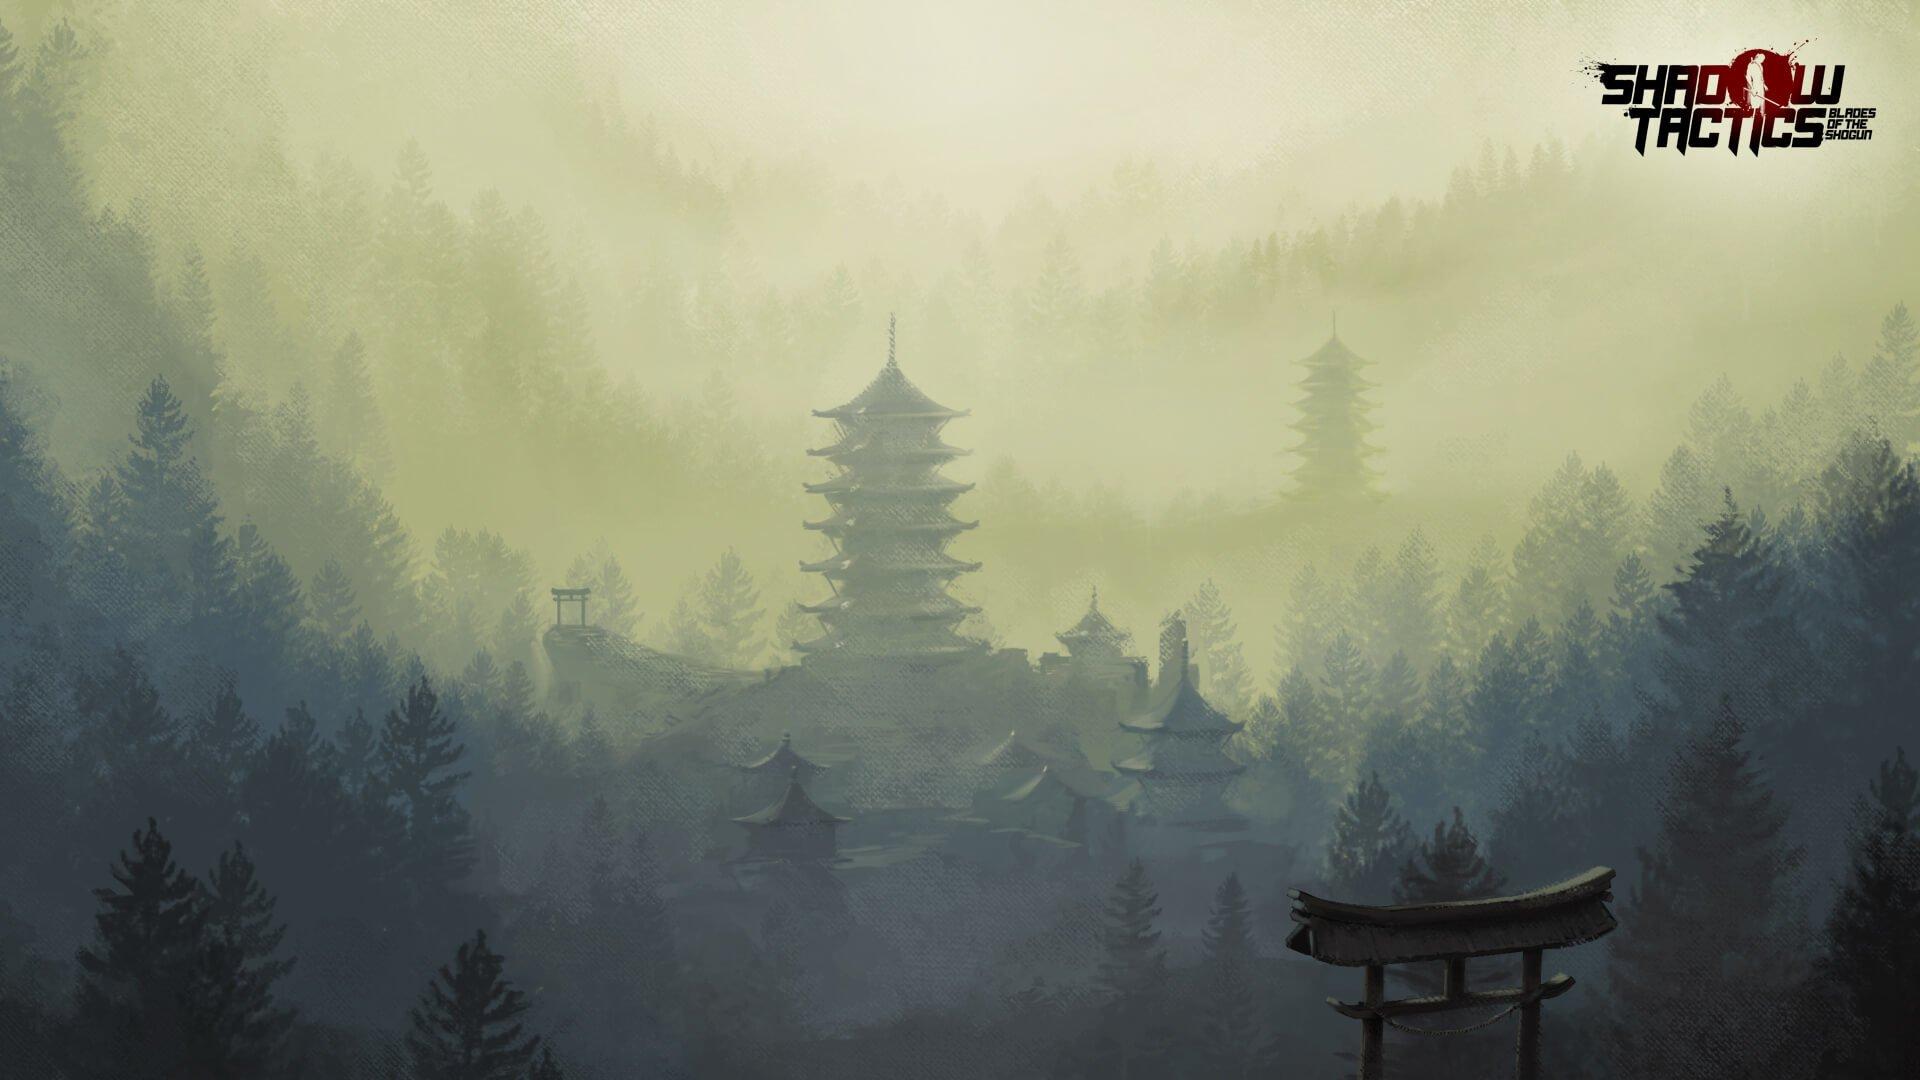 Video Game - Shadow Tactics: Blades of the Shogun  Wallpaper